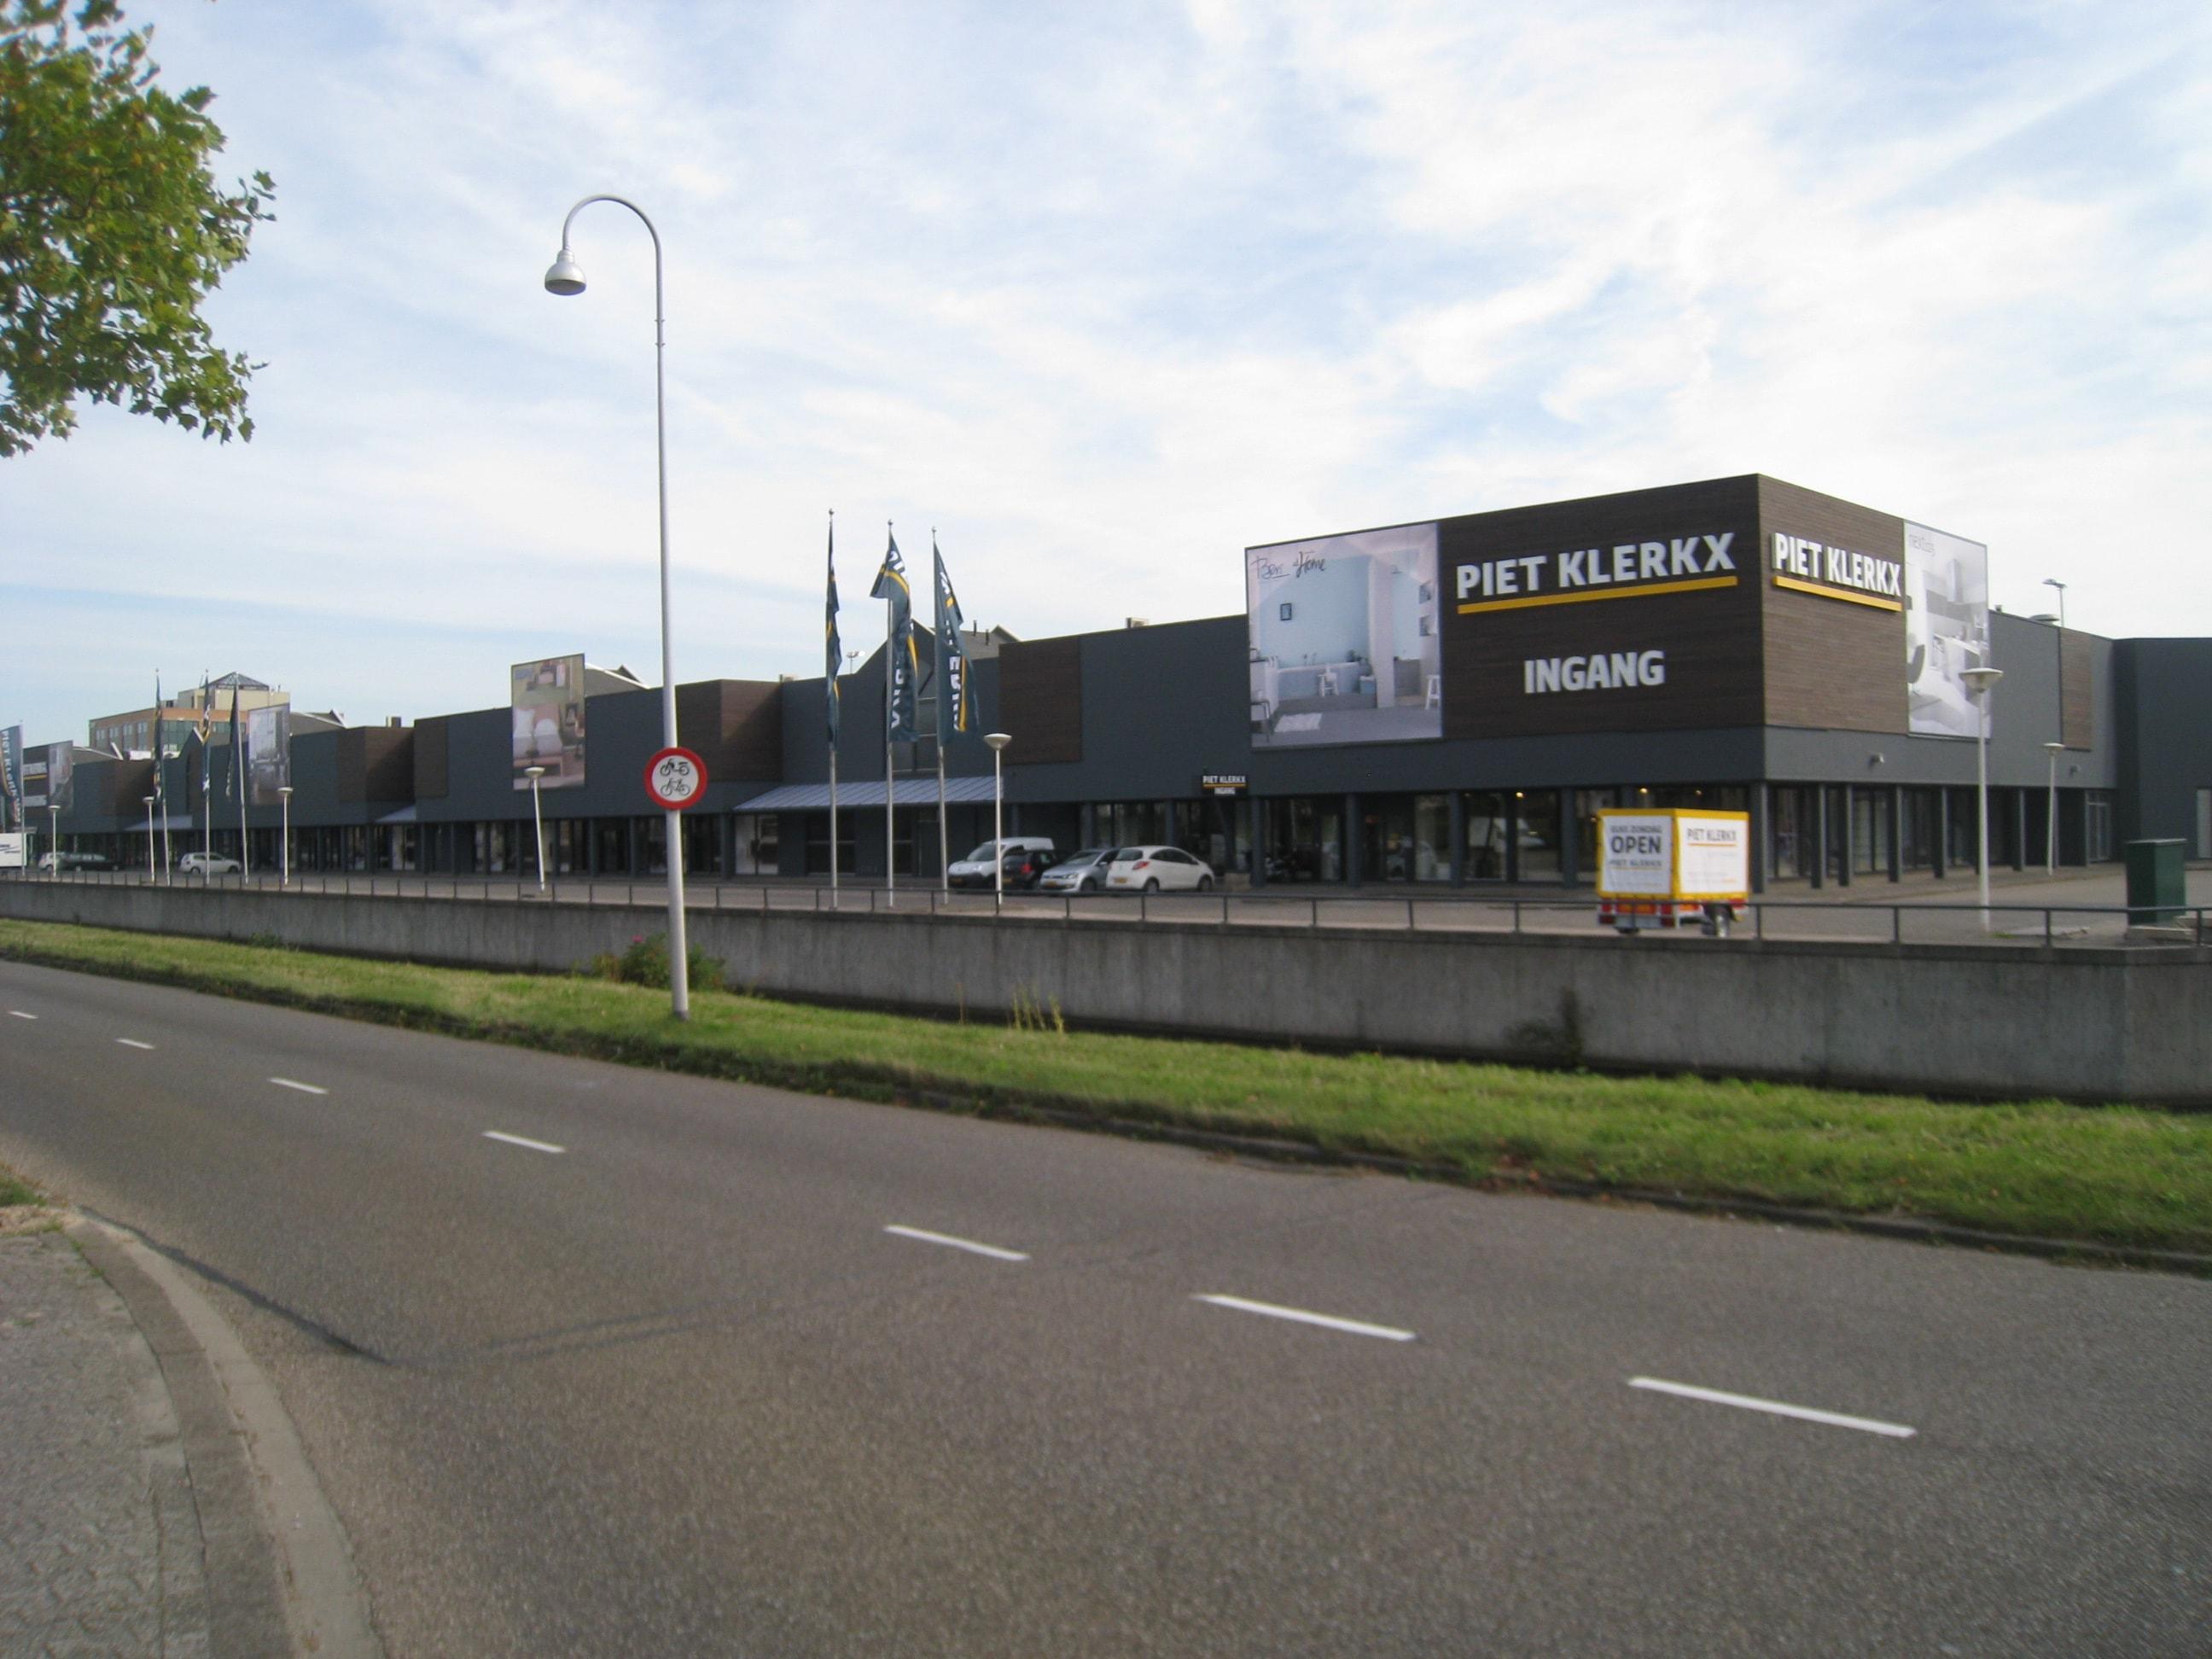 Piet Klerkx Website : Piet klerkx amersfoort c w groep